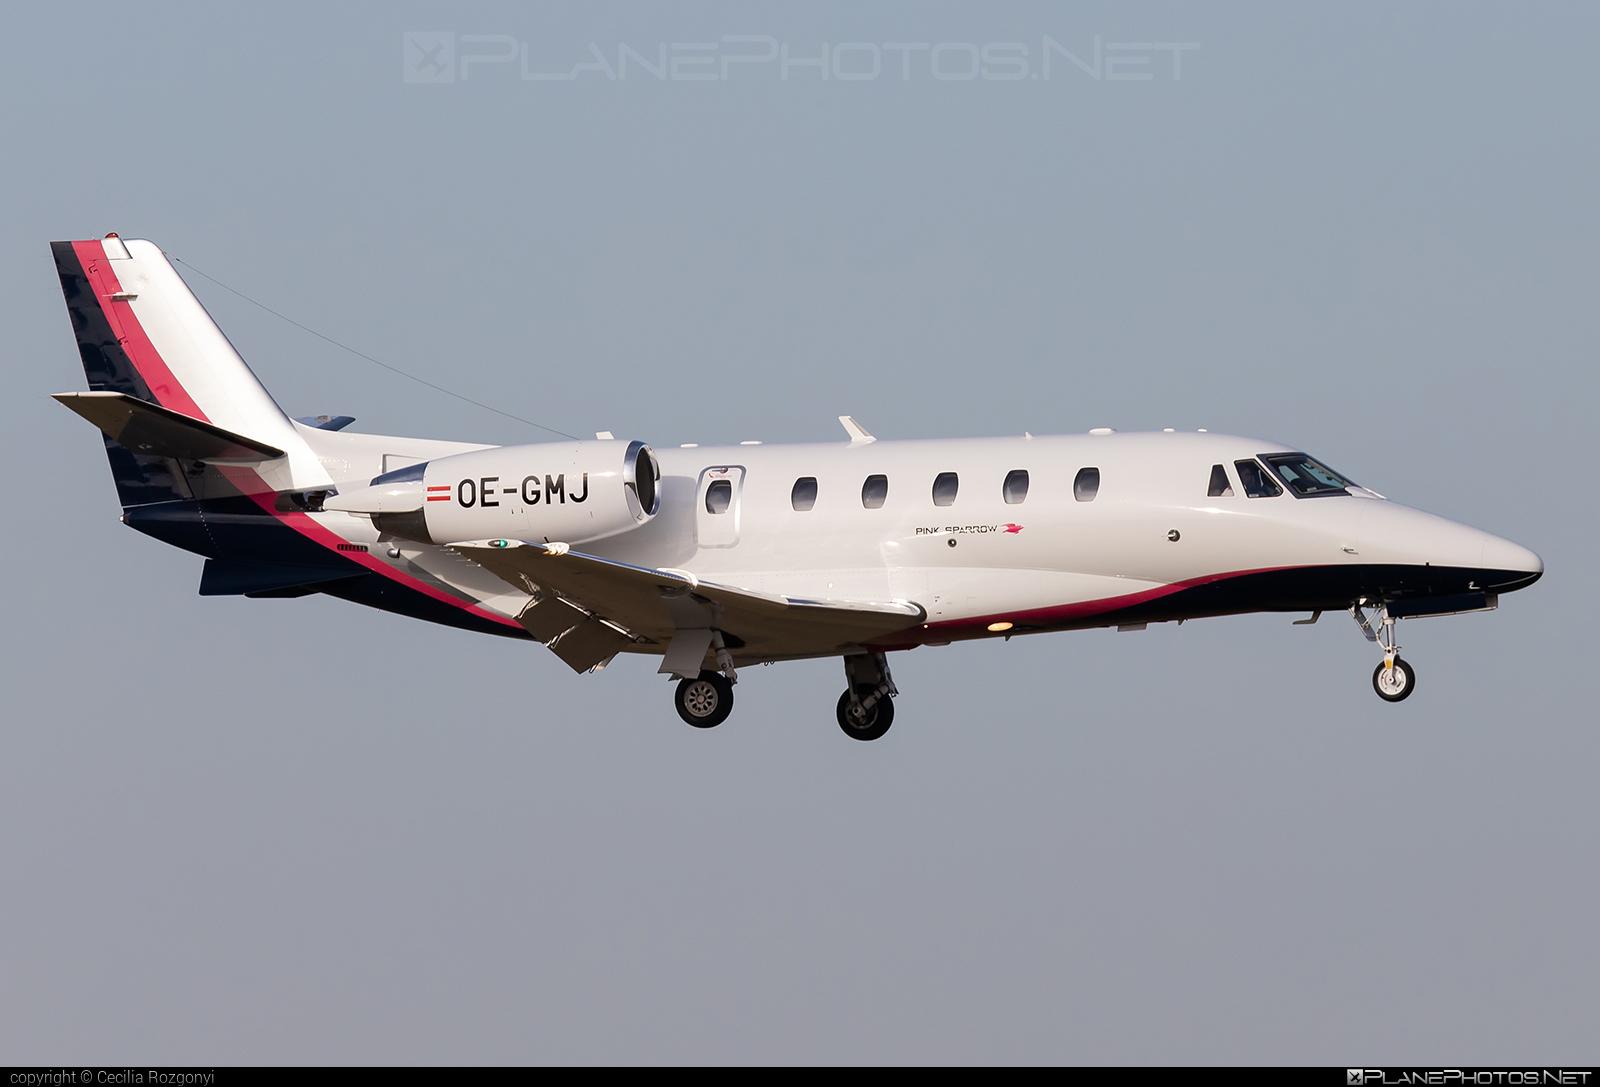 Cessna 560XL Citation XLS+ - OE-GMJ operated by Pink Sparrow #cessna #cessna560 #cessna560citation #cessna560xl #cessna560xlcitationxls #cessnacitation #citationxlsplus #pinksparrow